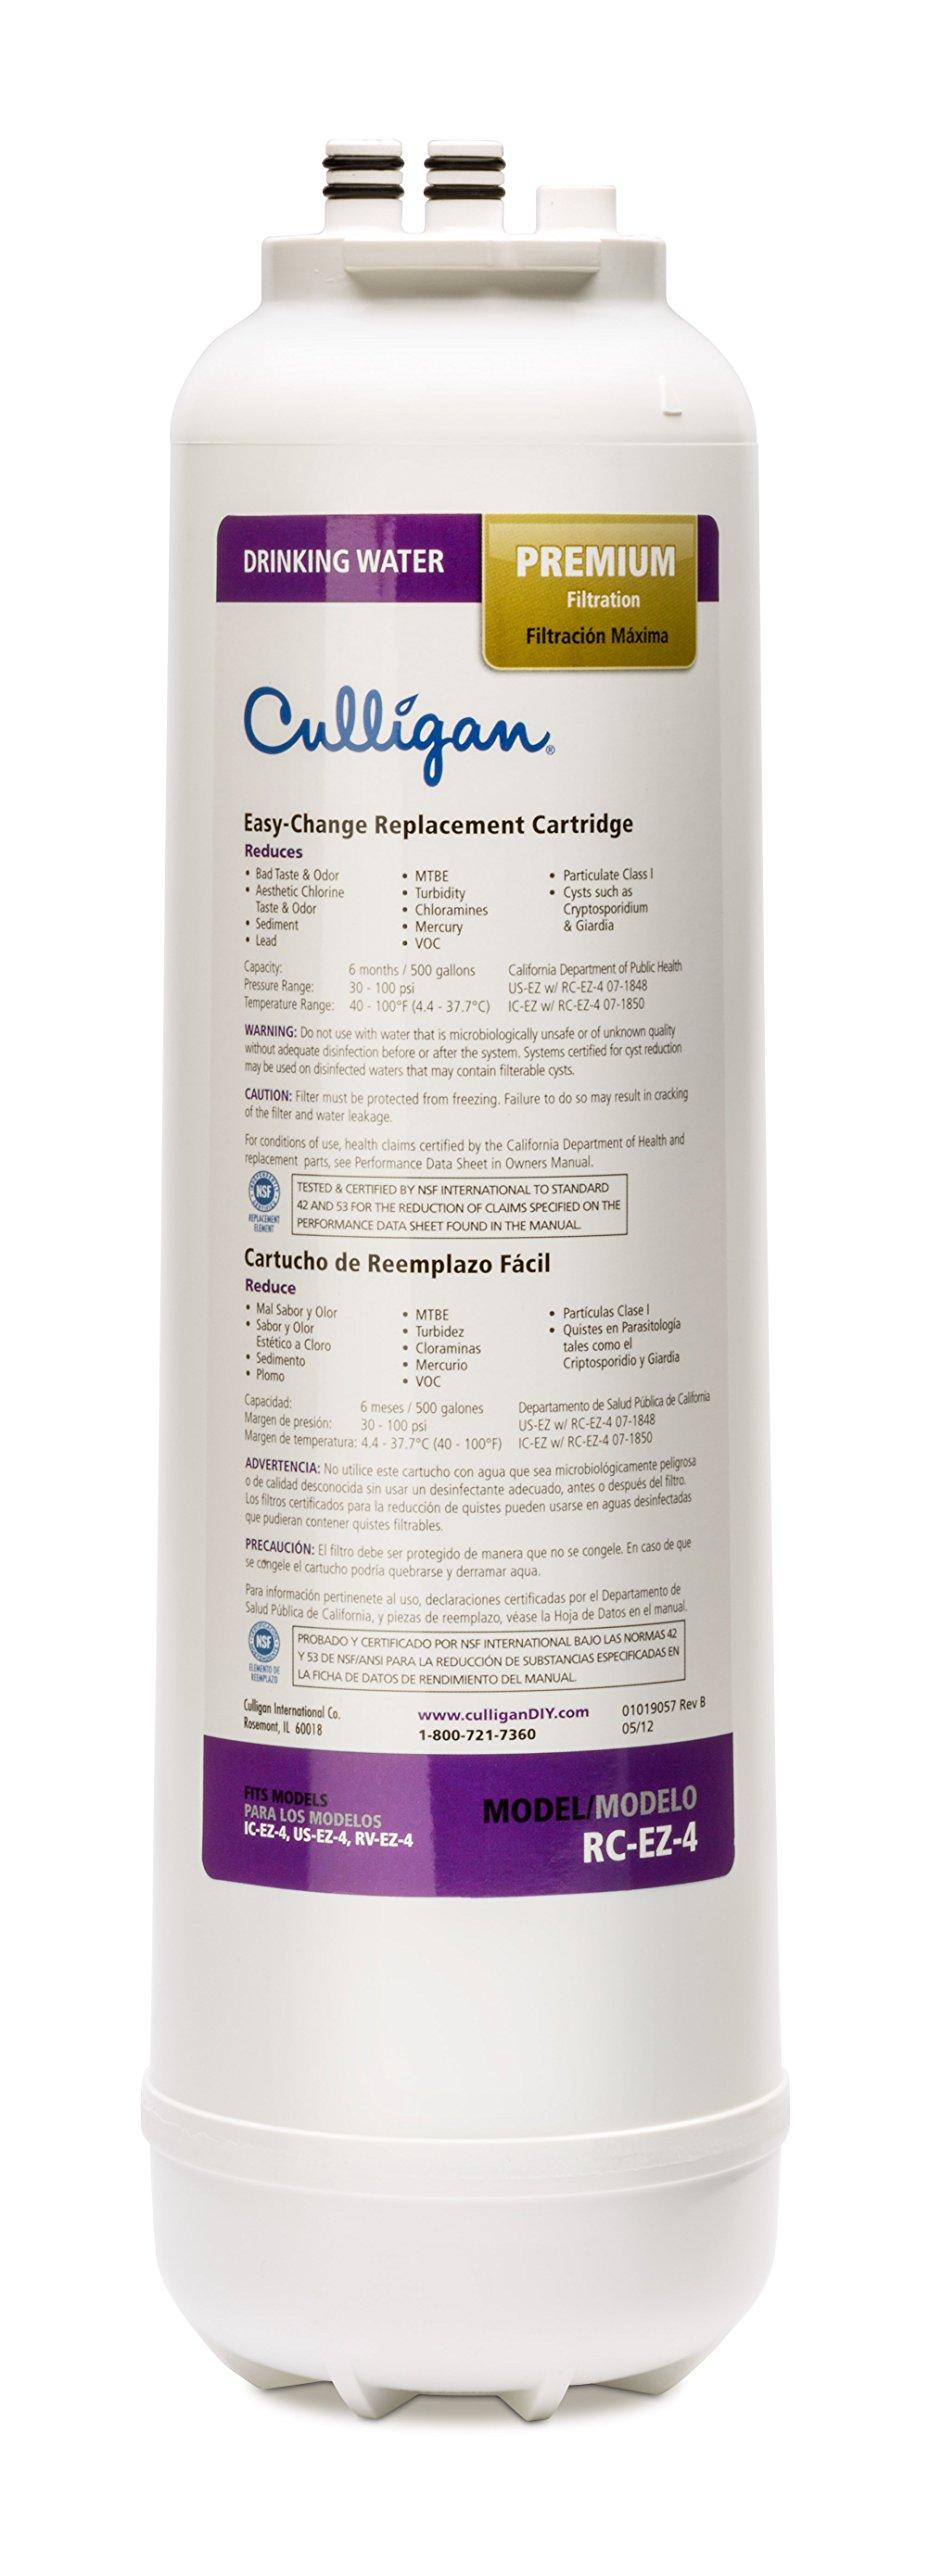 Culligan RC-EZ-4 EZ-Change Premium Water Filtration Replacement Cartridge, 500 Gallons